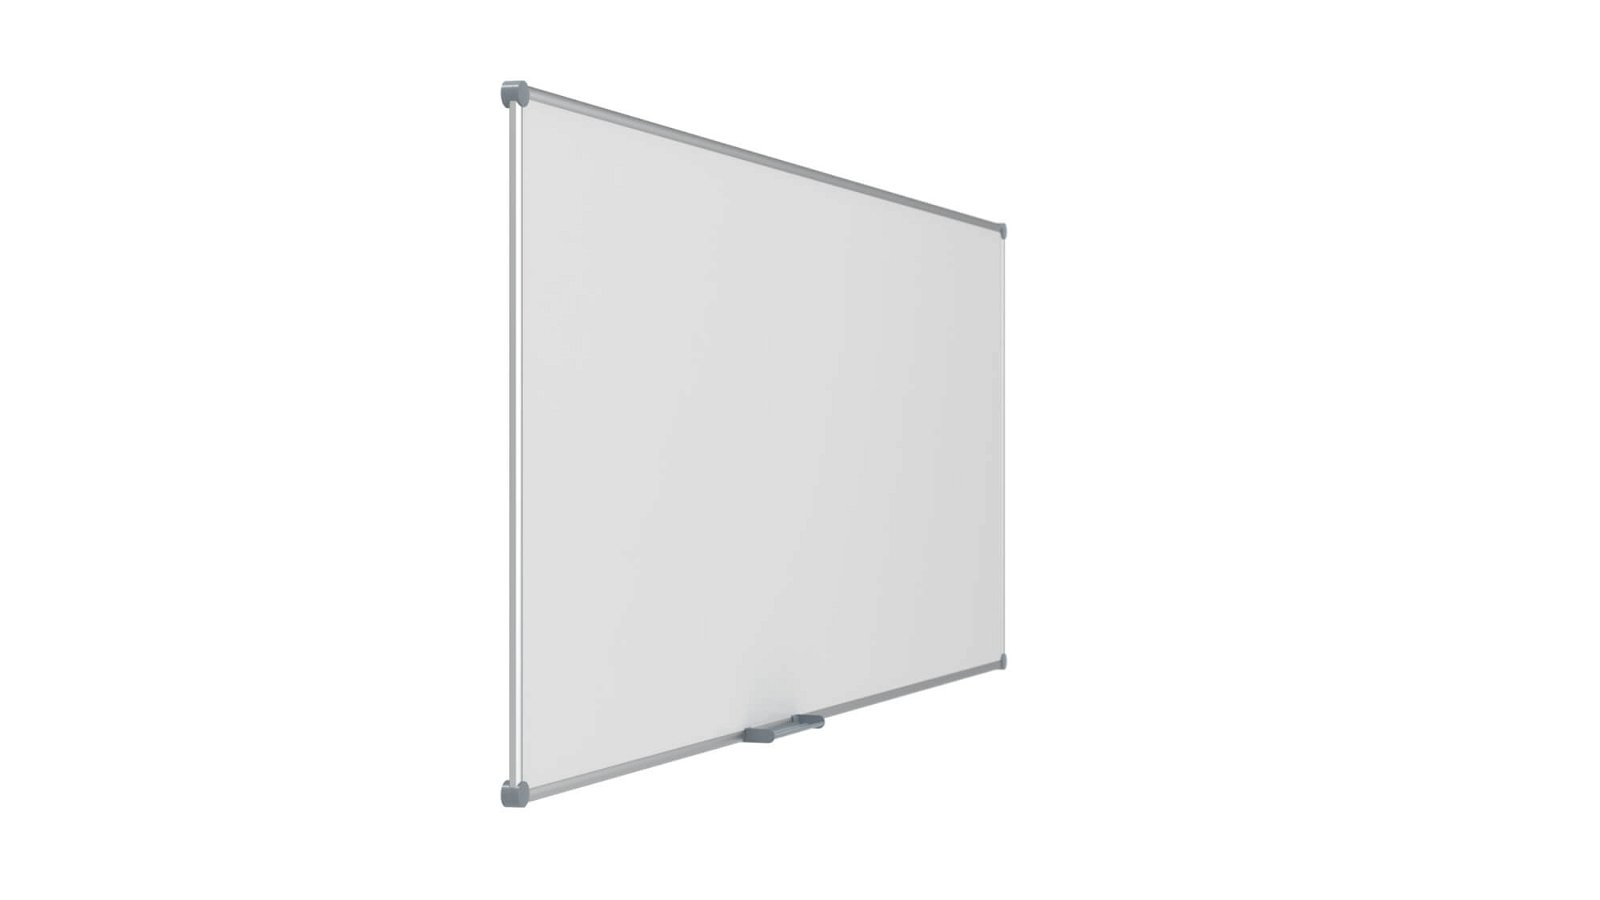 Whiteboard 2000 MAULpro, 120x300 cm, grau